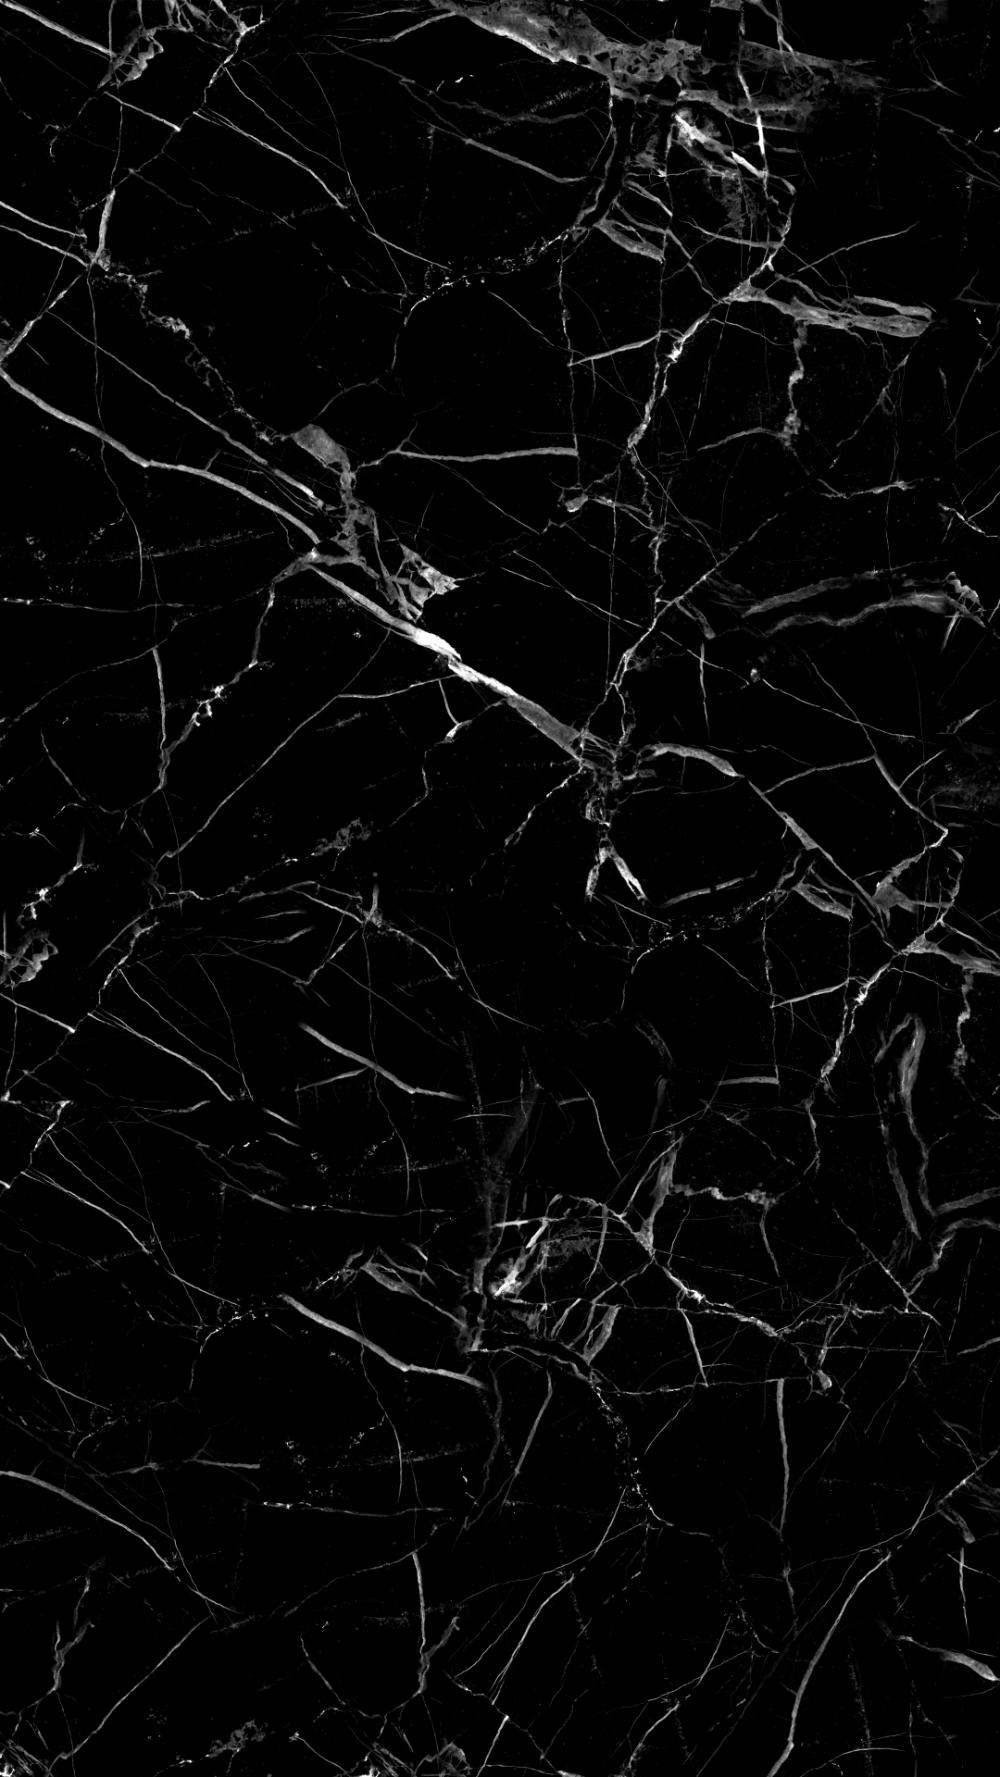 Black Marble Fulfilled Request 2160x3840 Amoledbackgrounds Marble Iphone Wallpaper Broken Screen Wallpaper Broken Glass Wallpaper